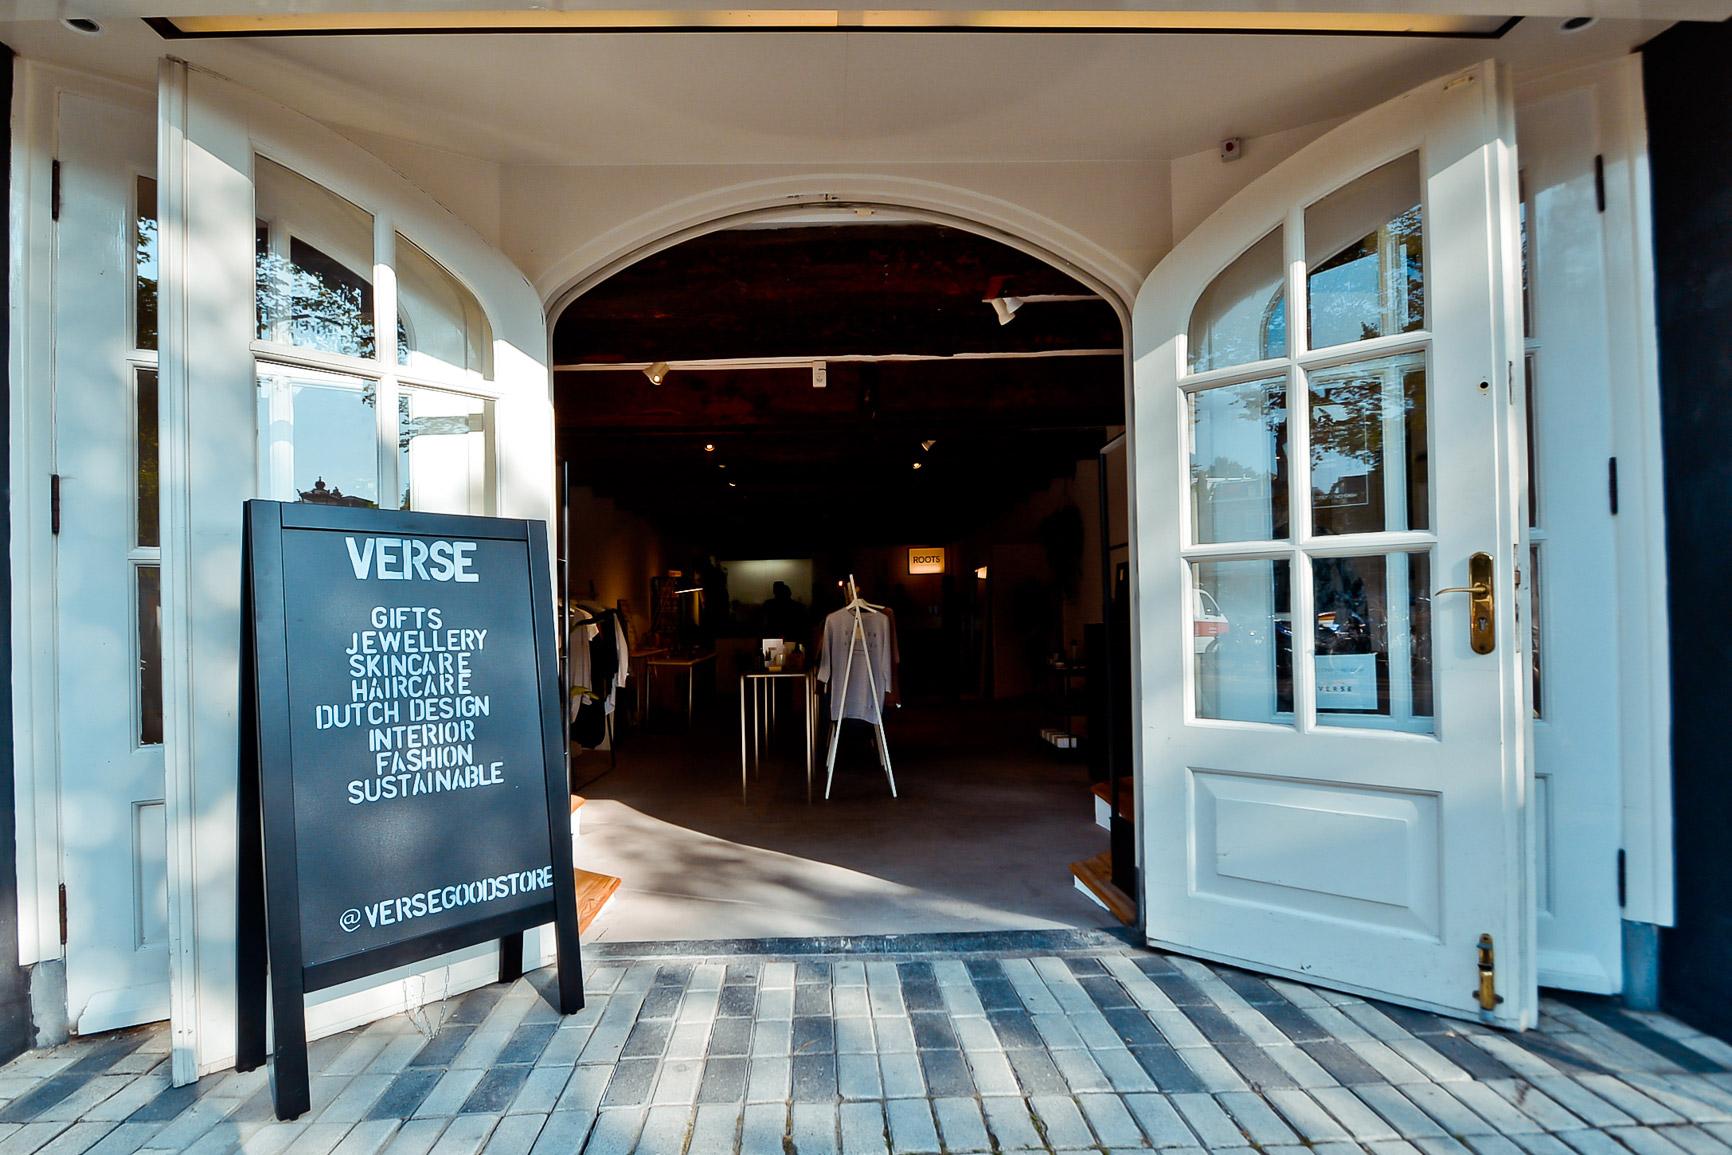 VERSE Good Store duurzame winkel in Amsterdam